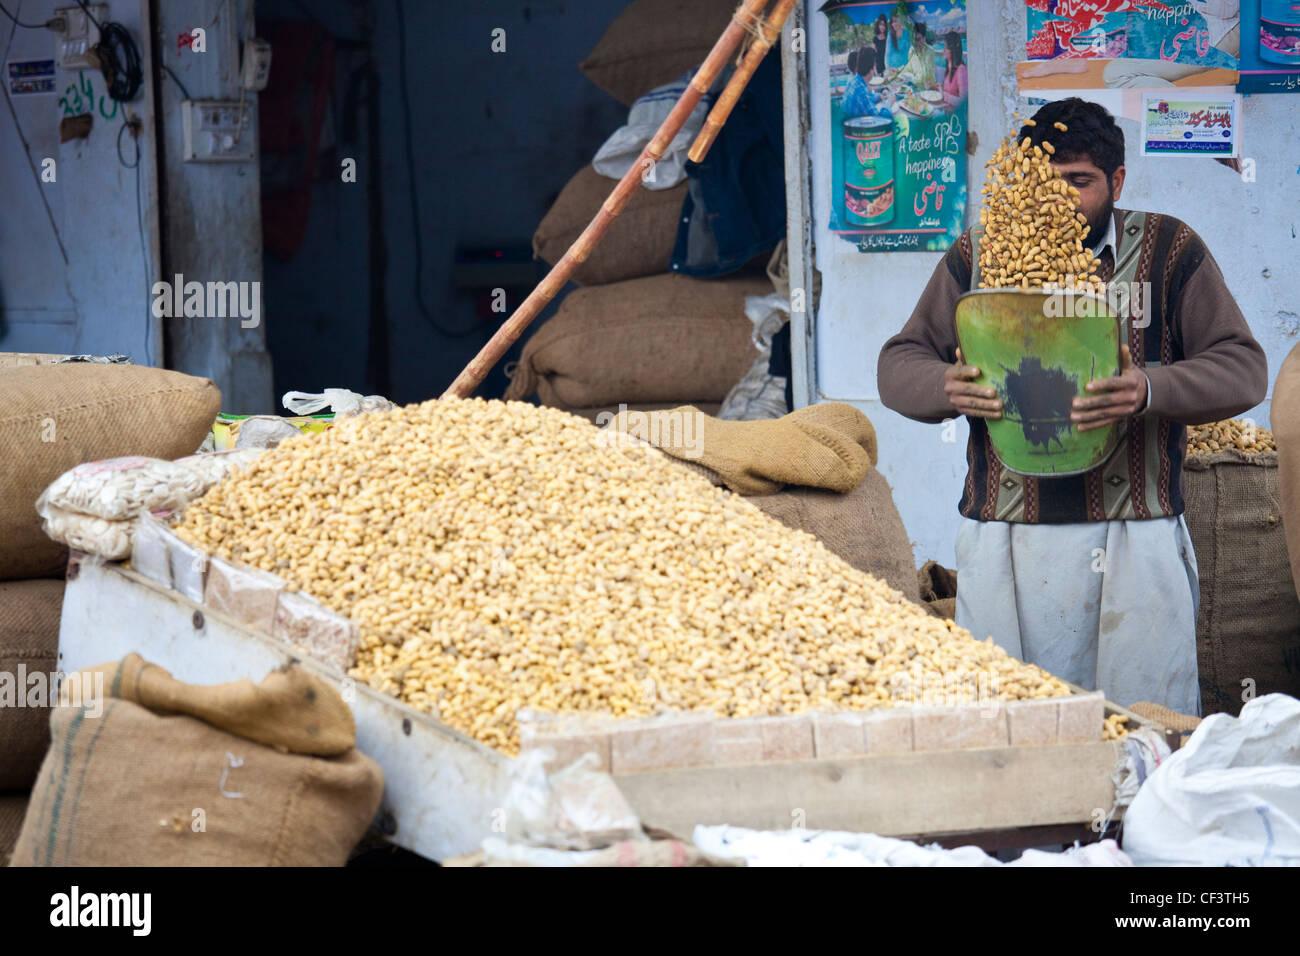 Nut vendor removing loose shells from peanuts, Islamabad, Pakistan - Stock Image